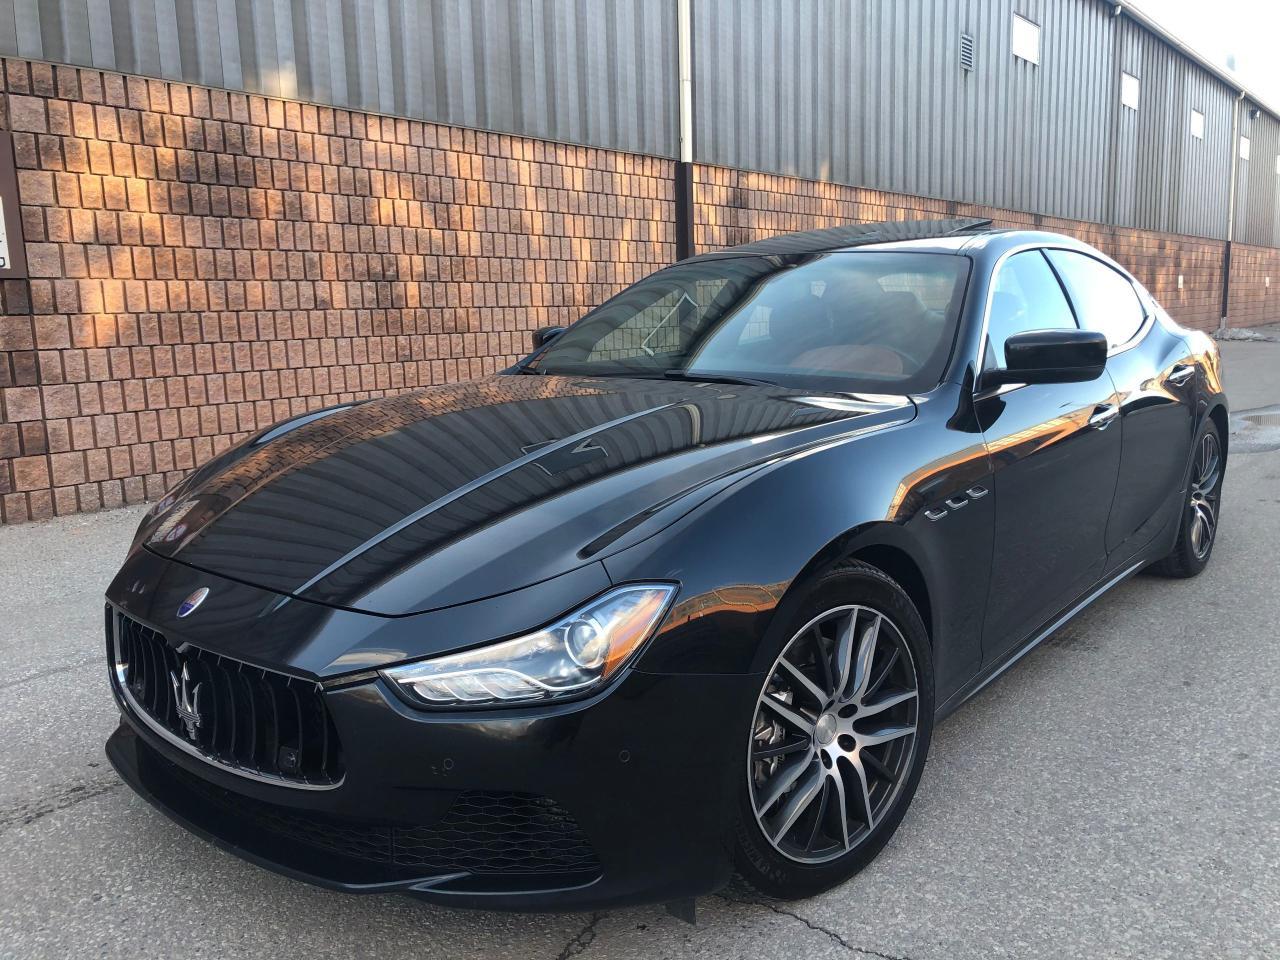 2014 Maserati Ghibli S Q4 SQ4 - AWD - NAVI - CAMERA - REMOTE START - 1 OWNER